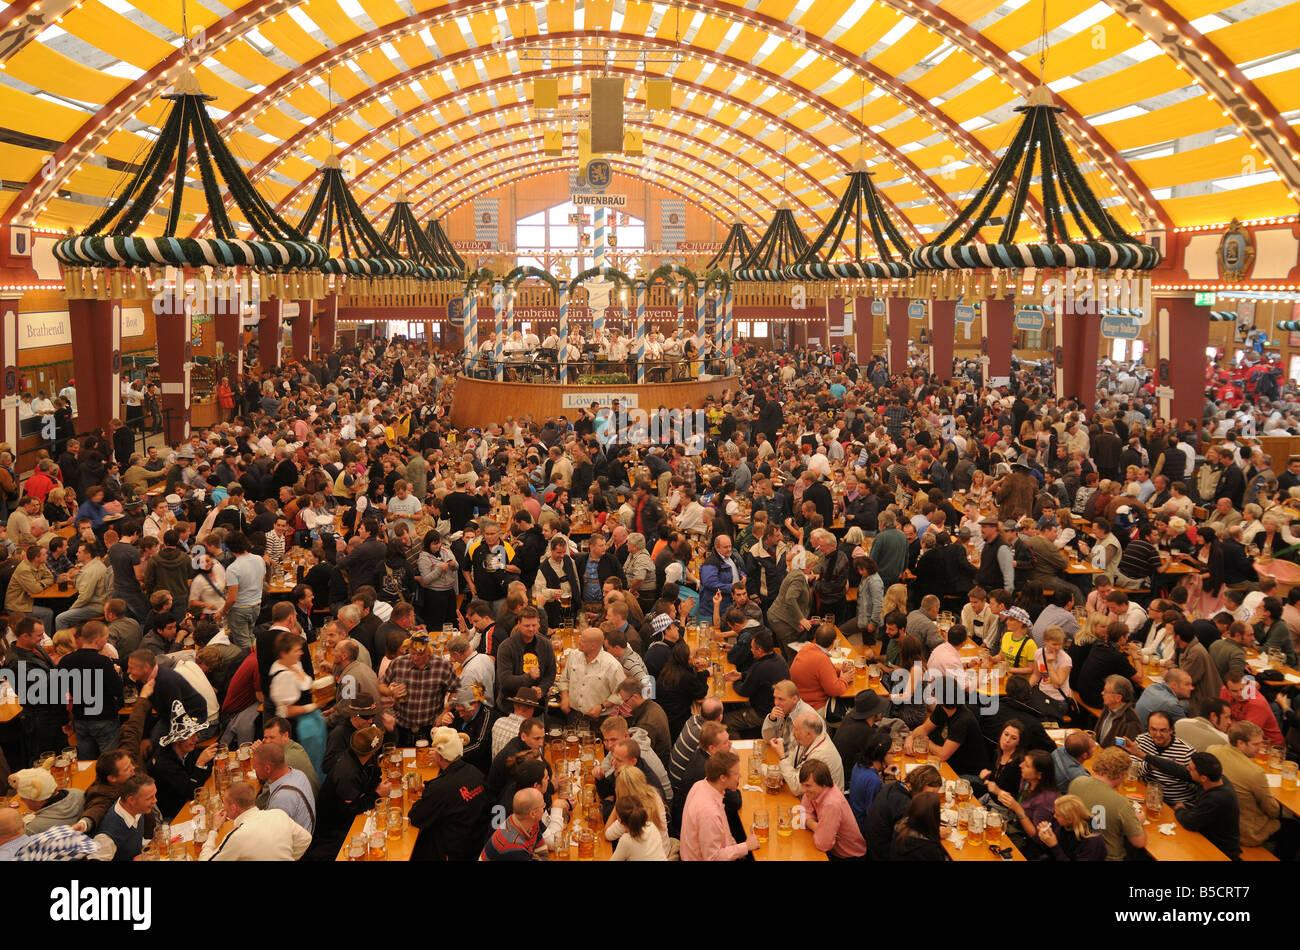 Crowded Oktoberfest beer tent Munich & Crowded Oktoberfest beer tent Munich Stock Photo Royalty Free ...